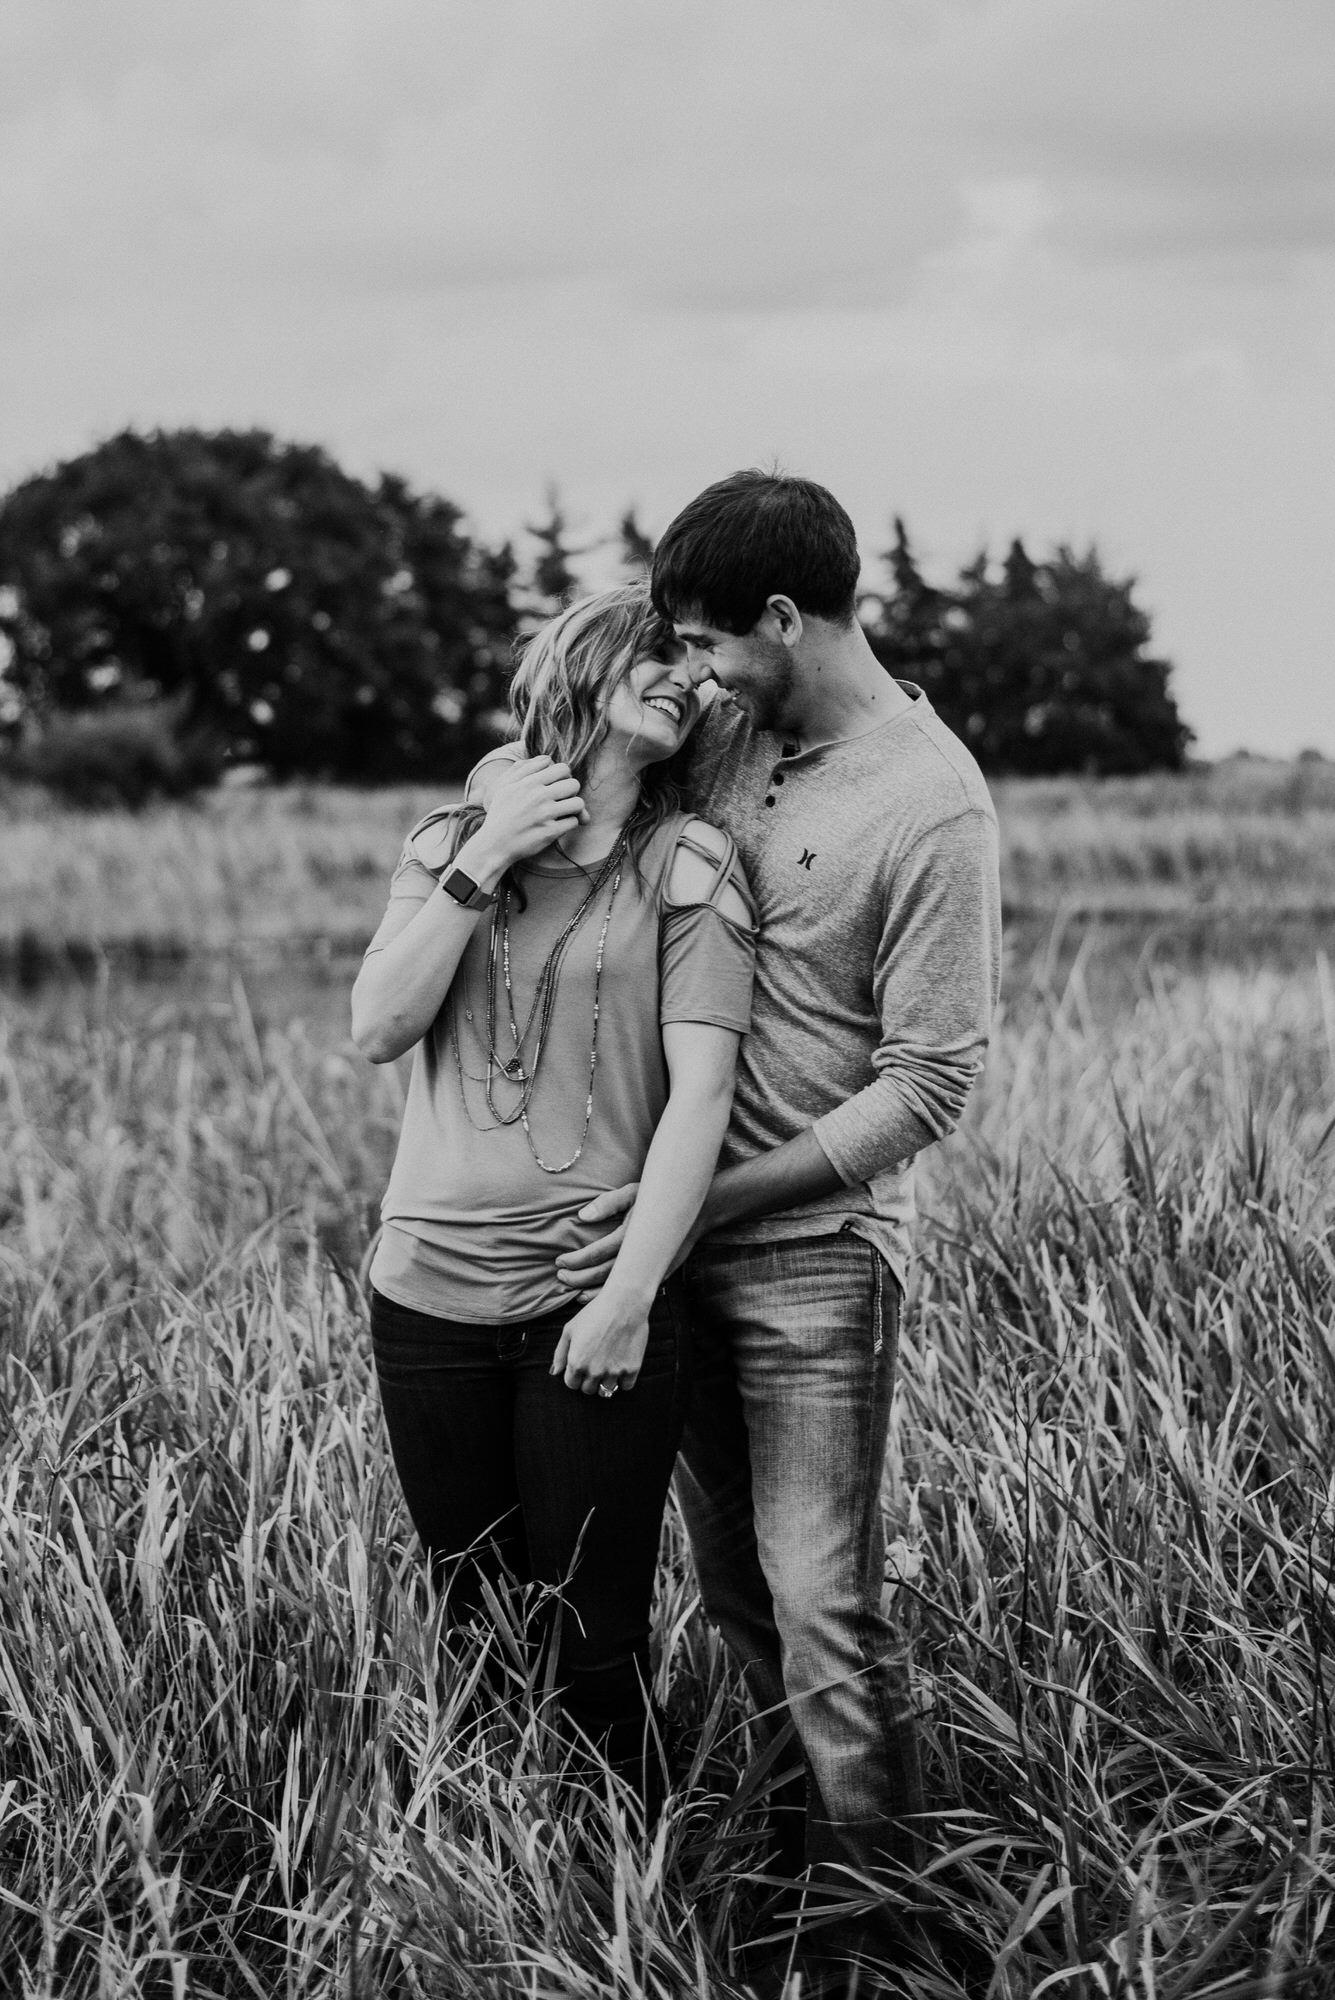 Kaylie-Sirek-Photography-wedding-engagement-photographer-Grand-Island-Kearney-Hastings-Lincoln-Nebraska-central-midwest-moments-trump-posing-natural-light-engaged-19.jpg